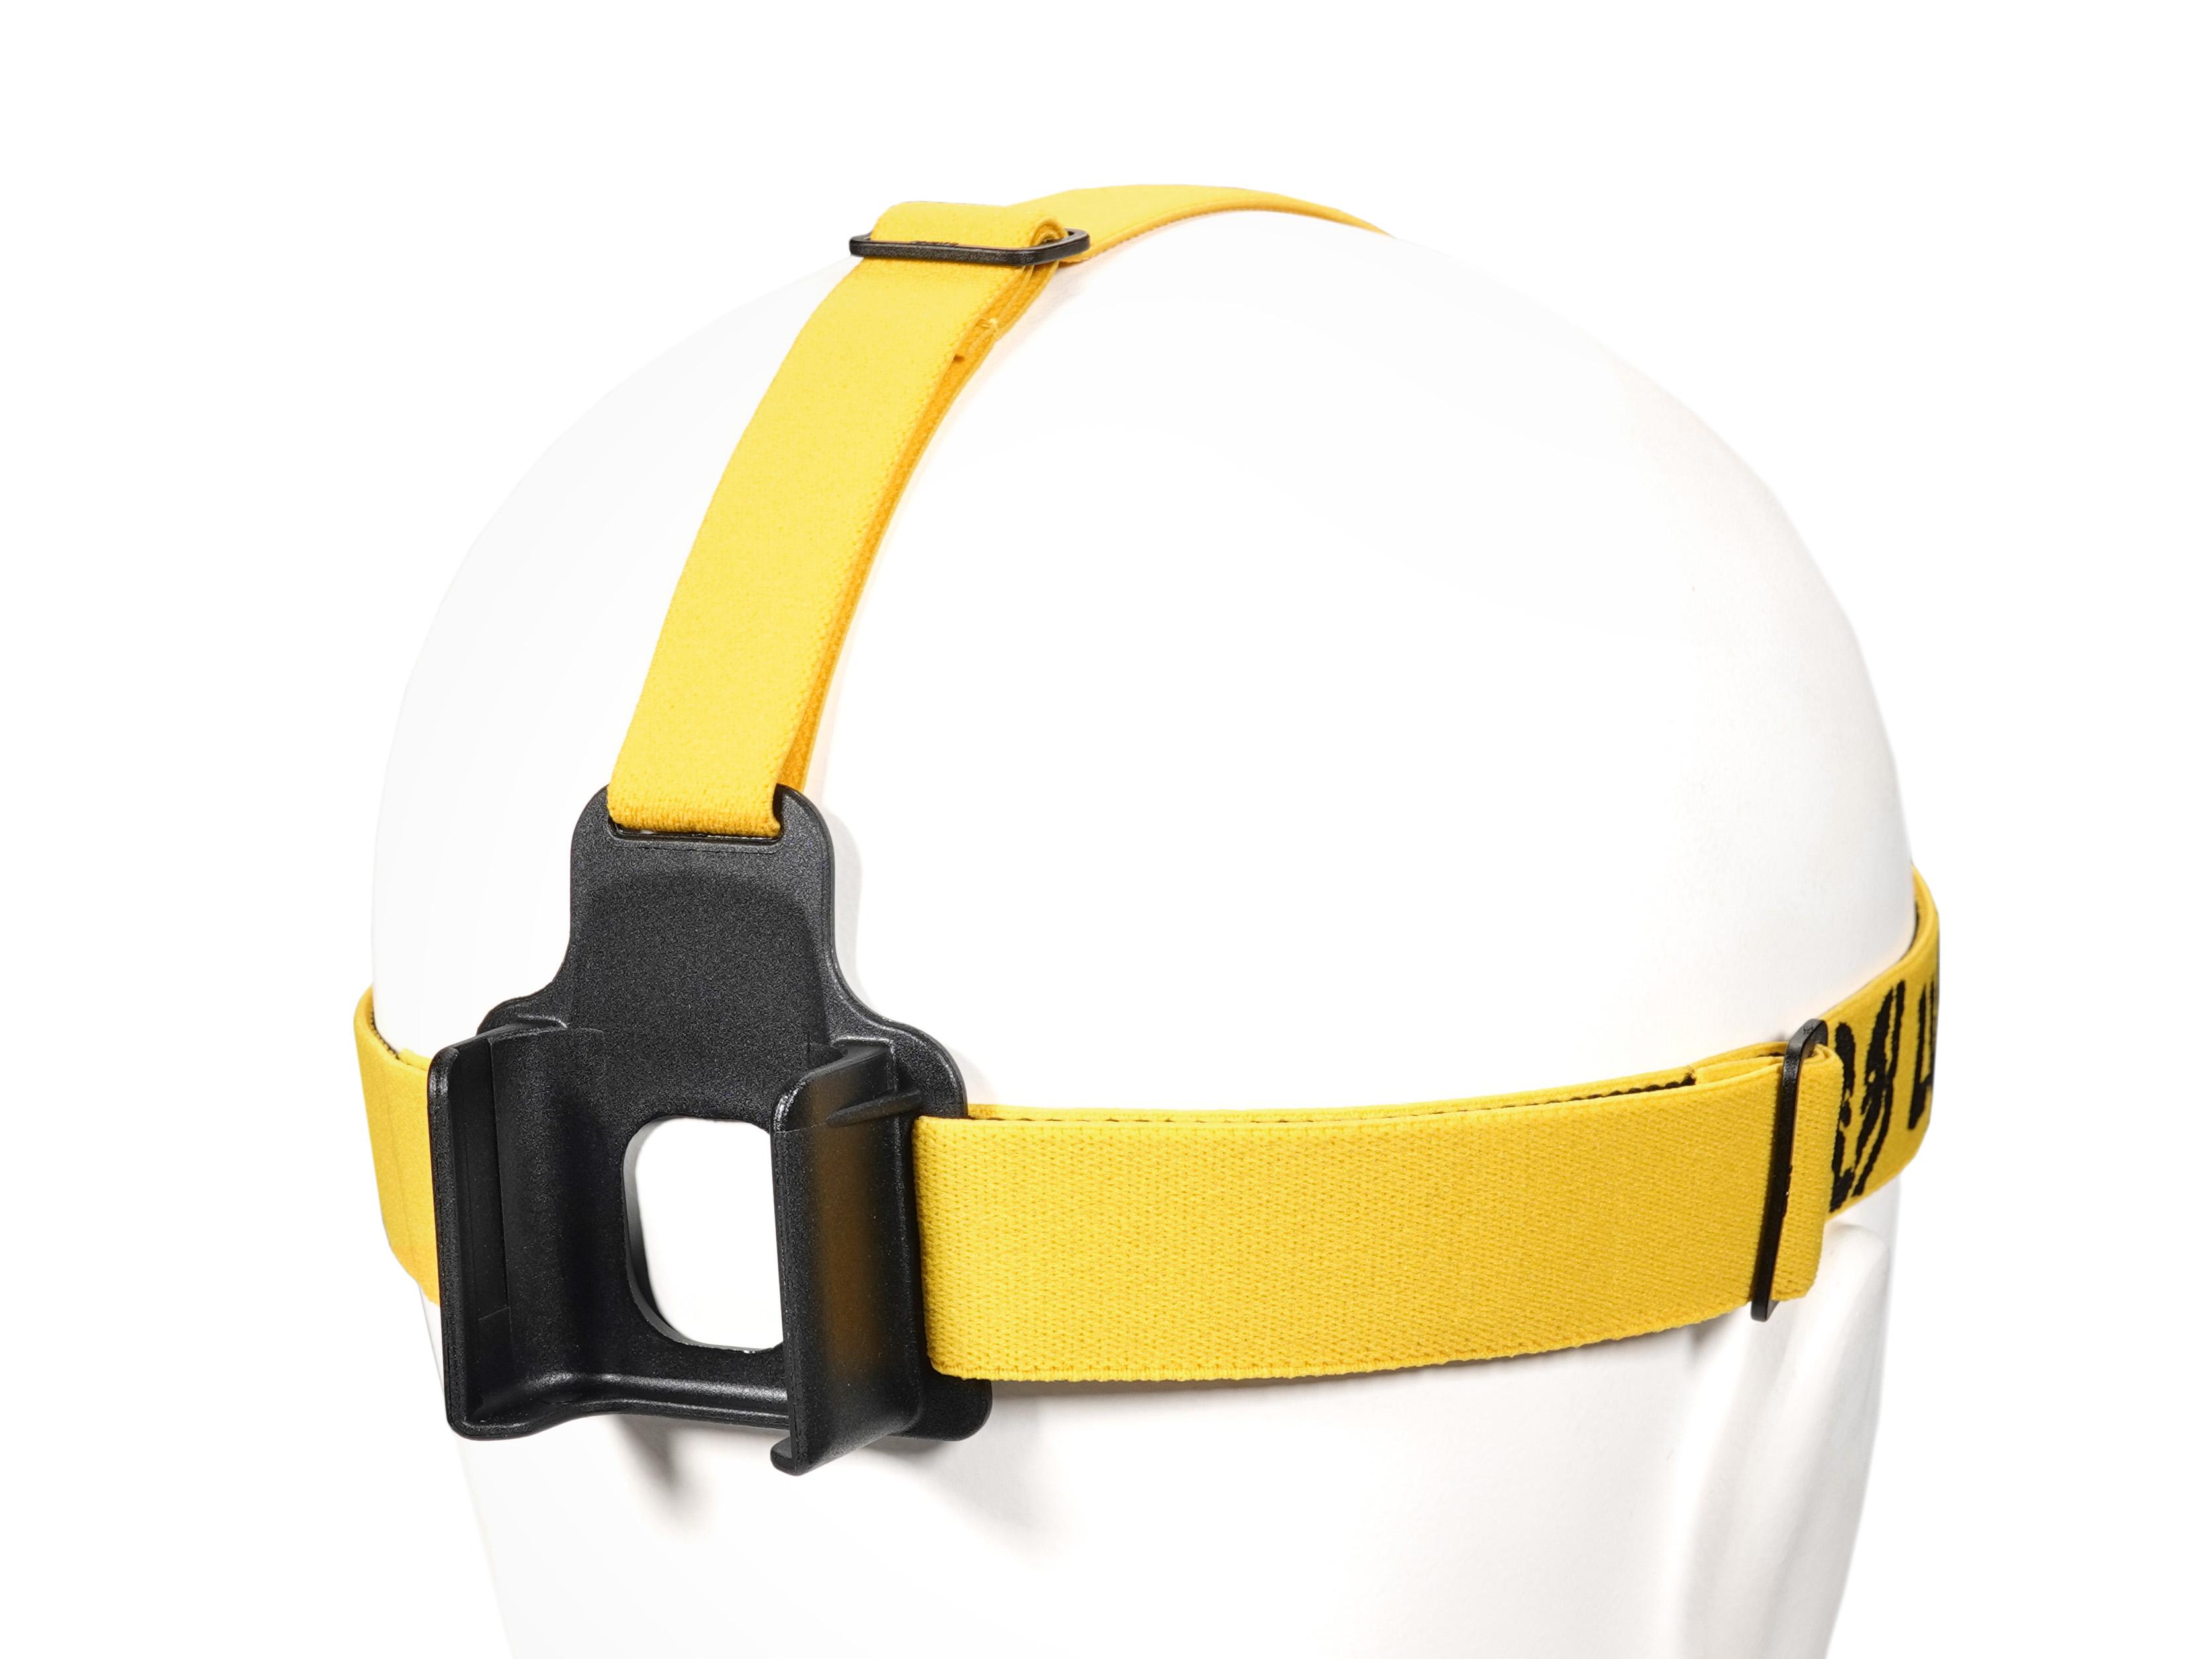 Stirnband FrontClick Neo/Piko/Blika